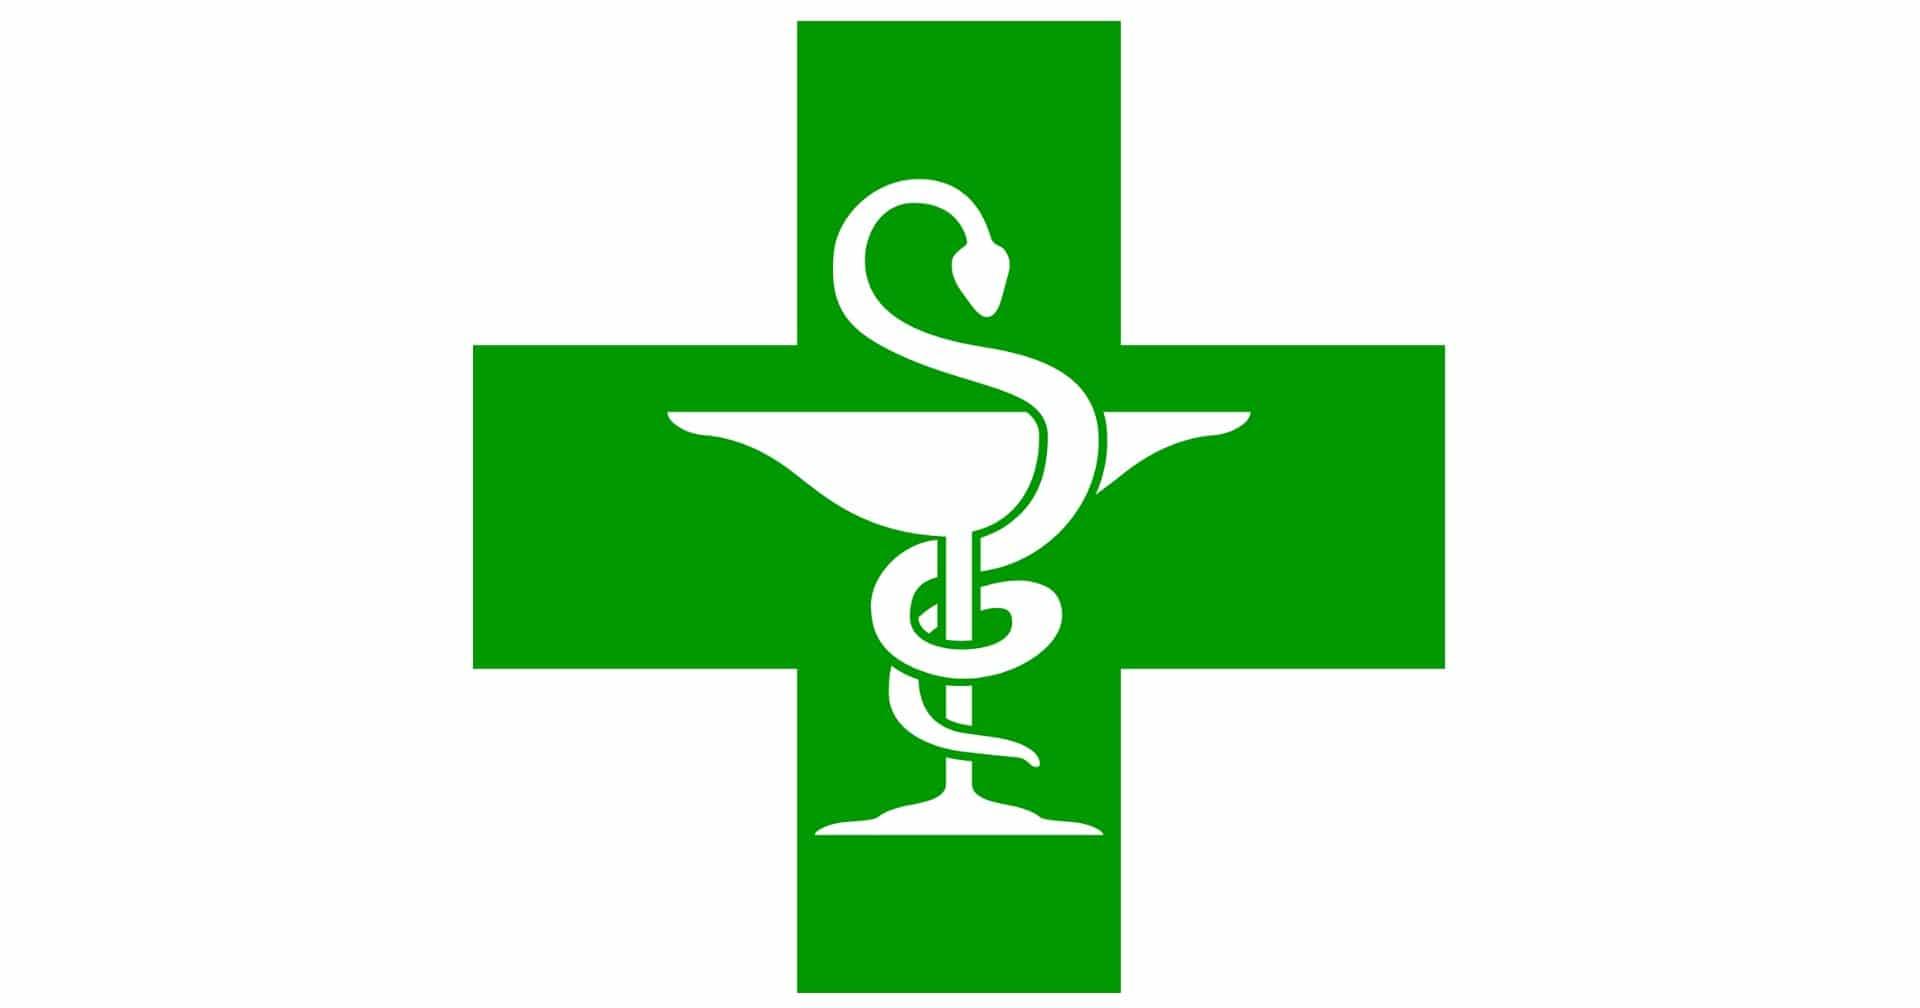 Pharmacie logo : histoire, signification et évolution, symbole